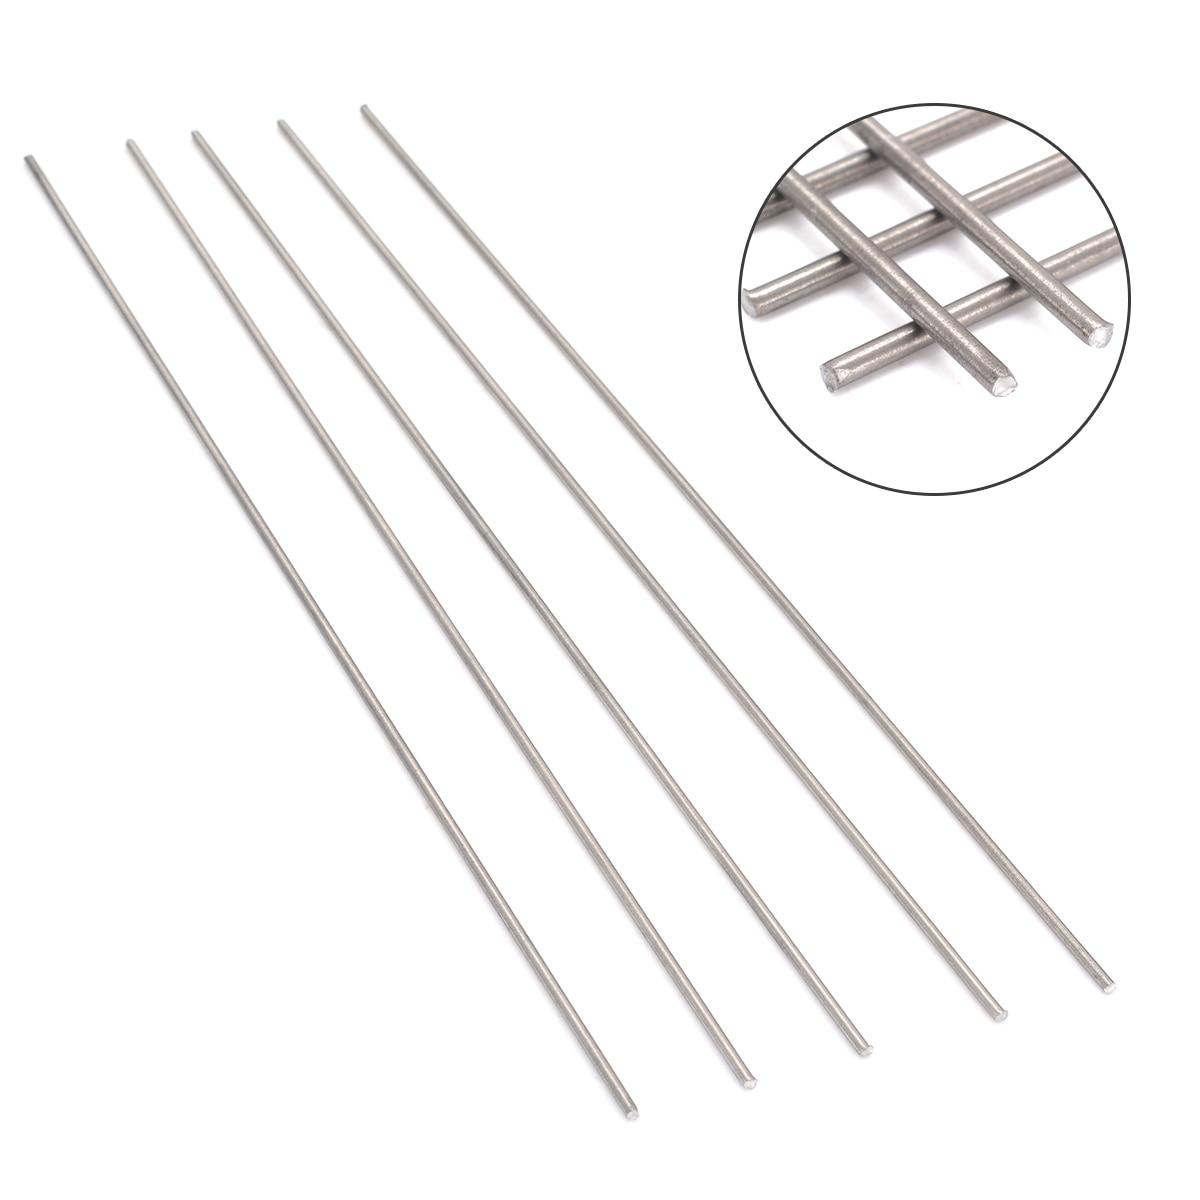 Aliexpress Buy 5pcs 2mm Diameter Titanium Ti Grade 5 Gr5 Metal Rod 250mm Length For